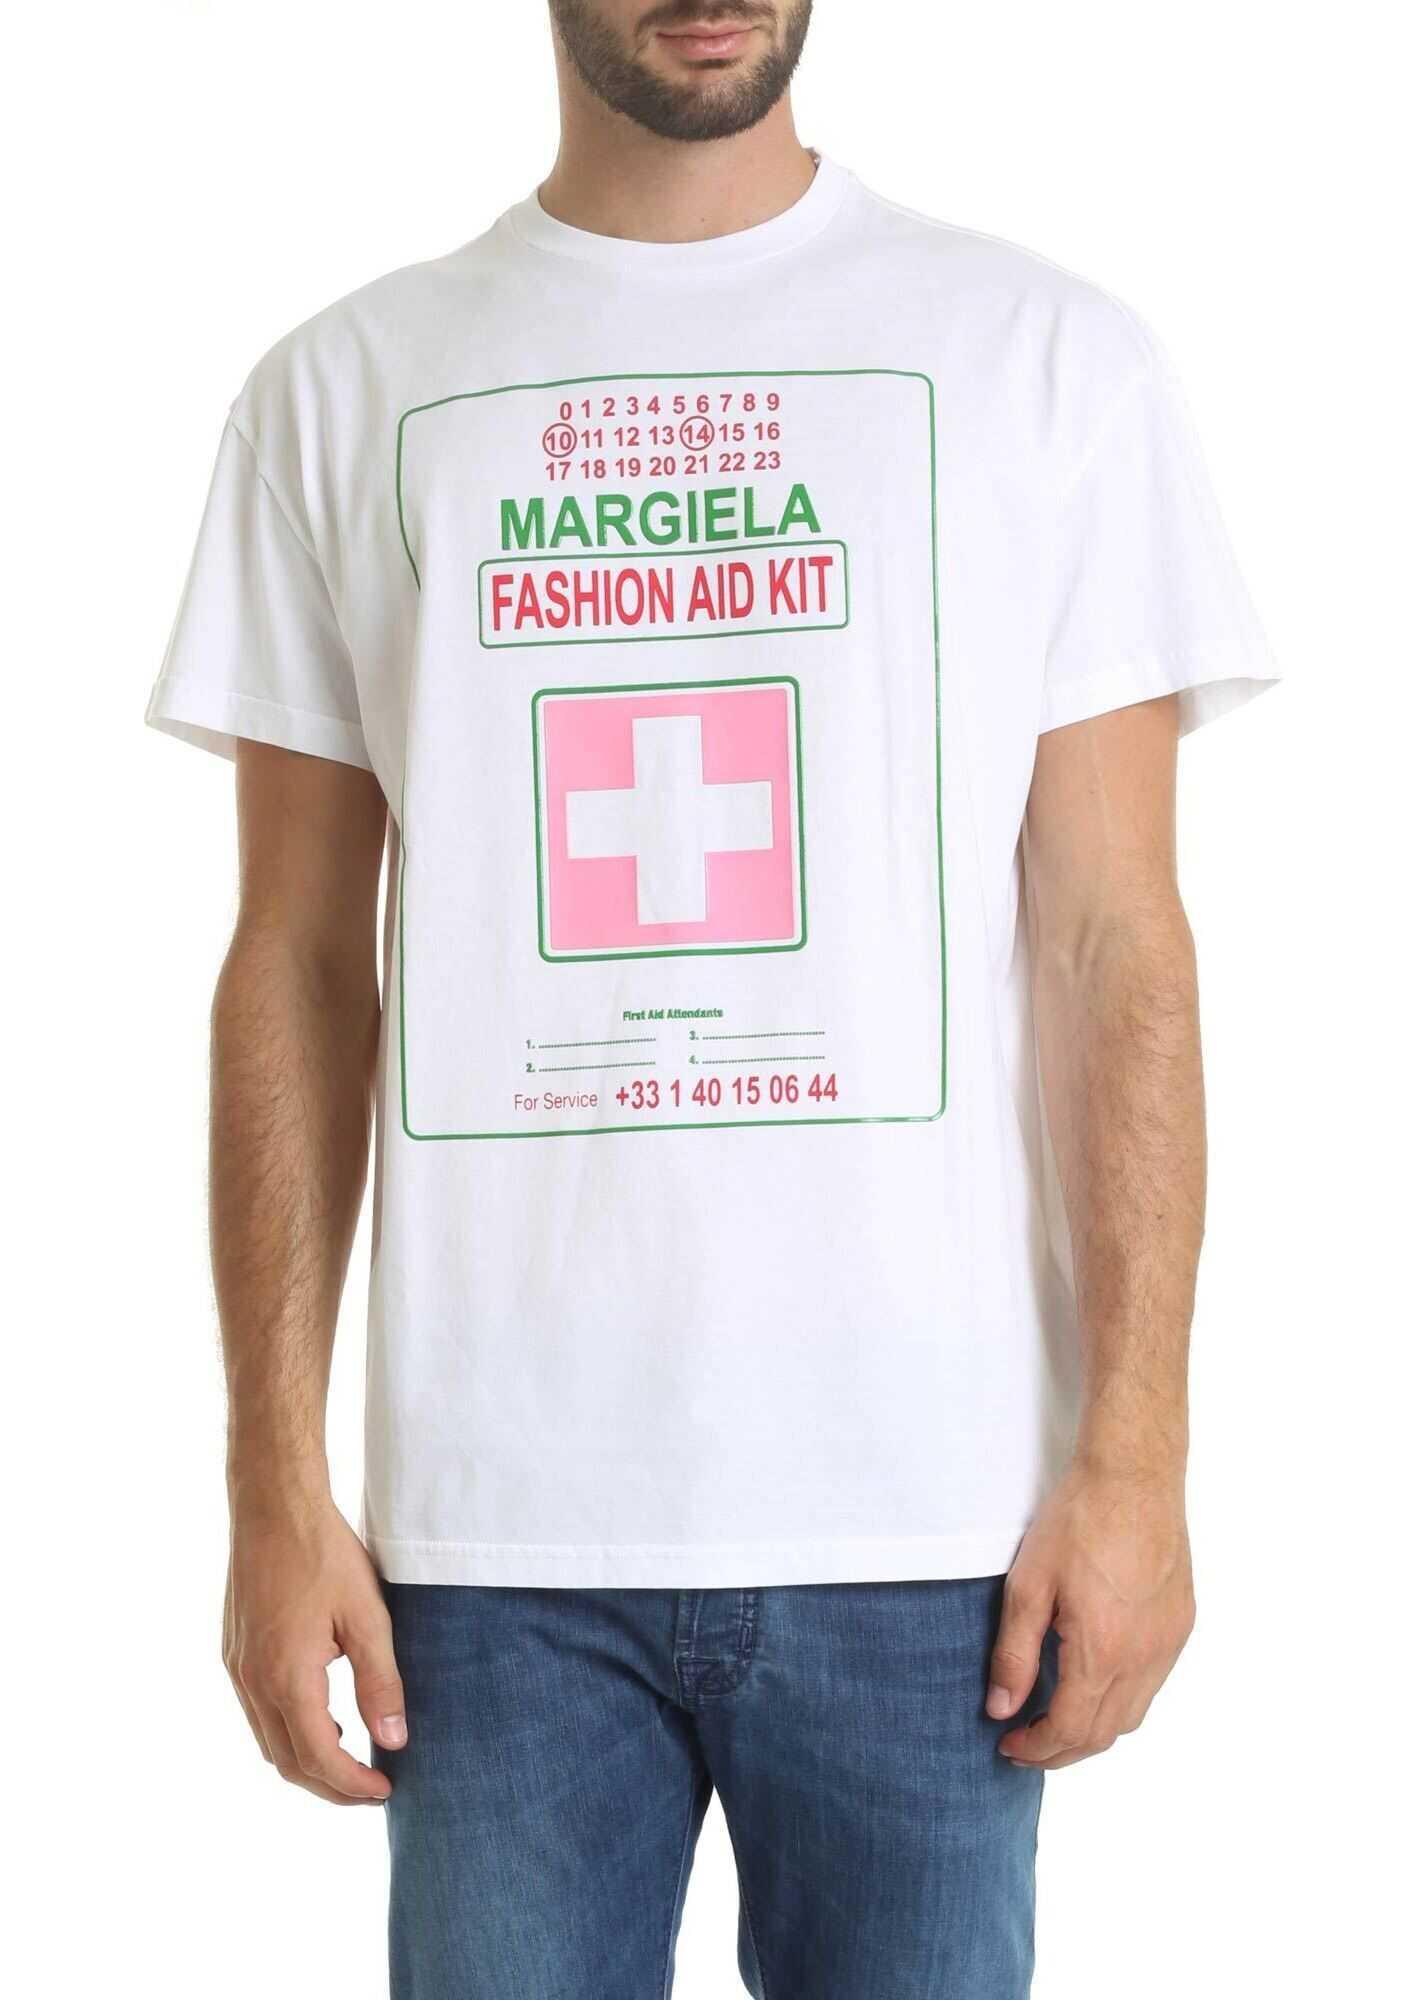 Margiela Fashion Aid Kit White T-Shirt